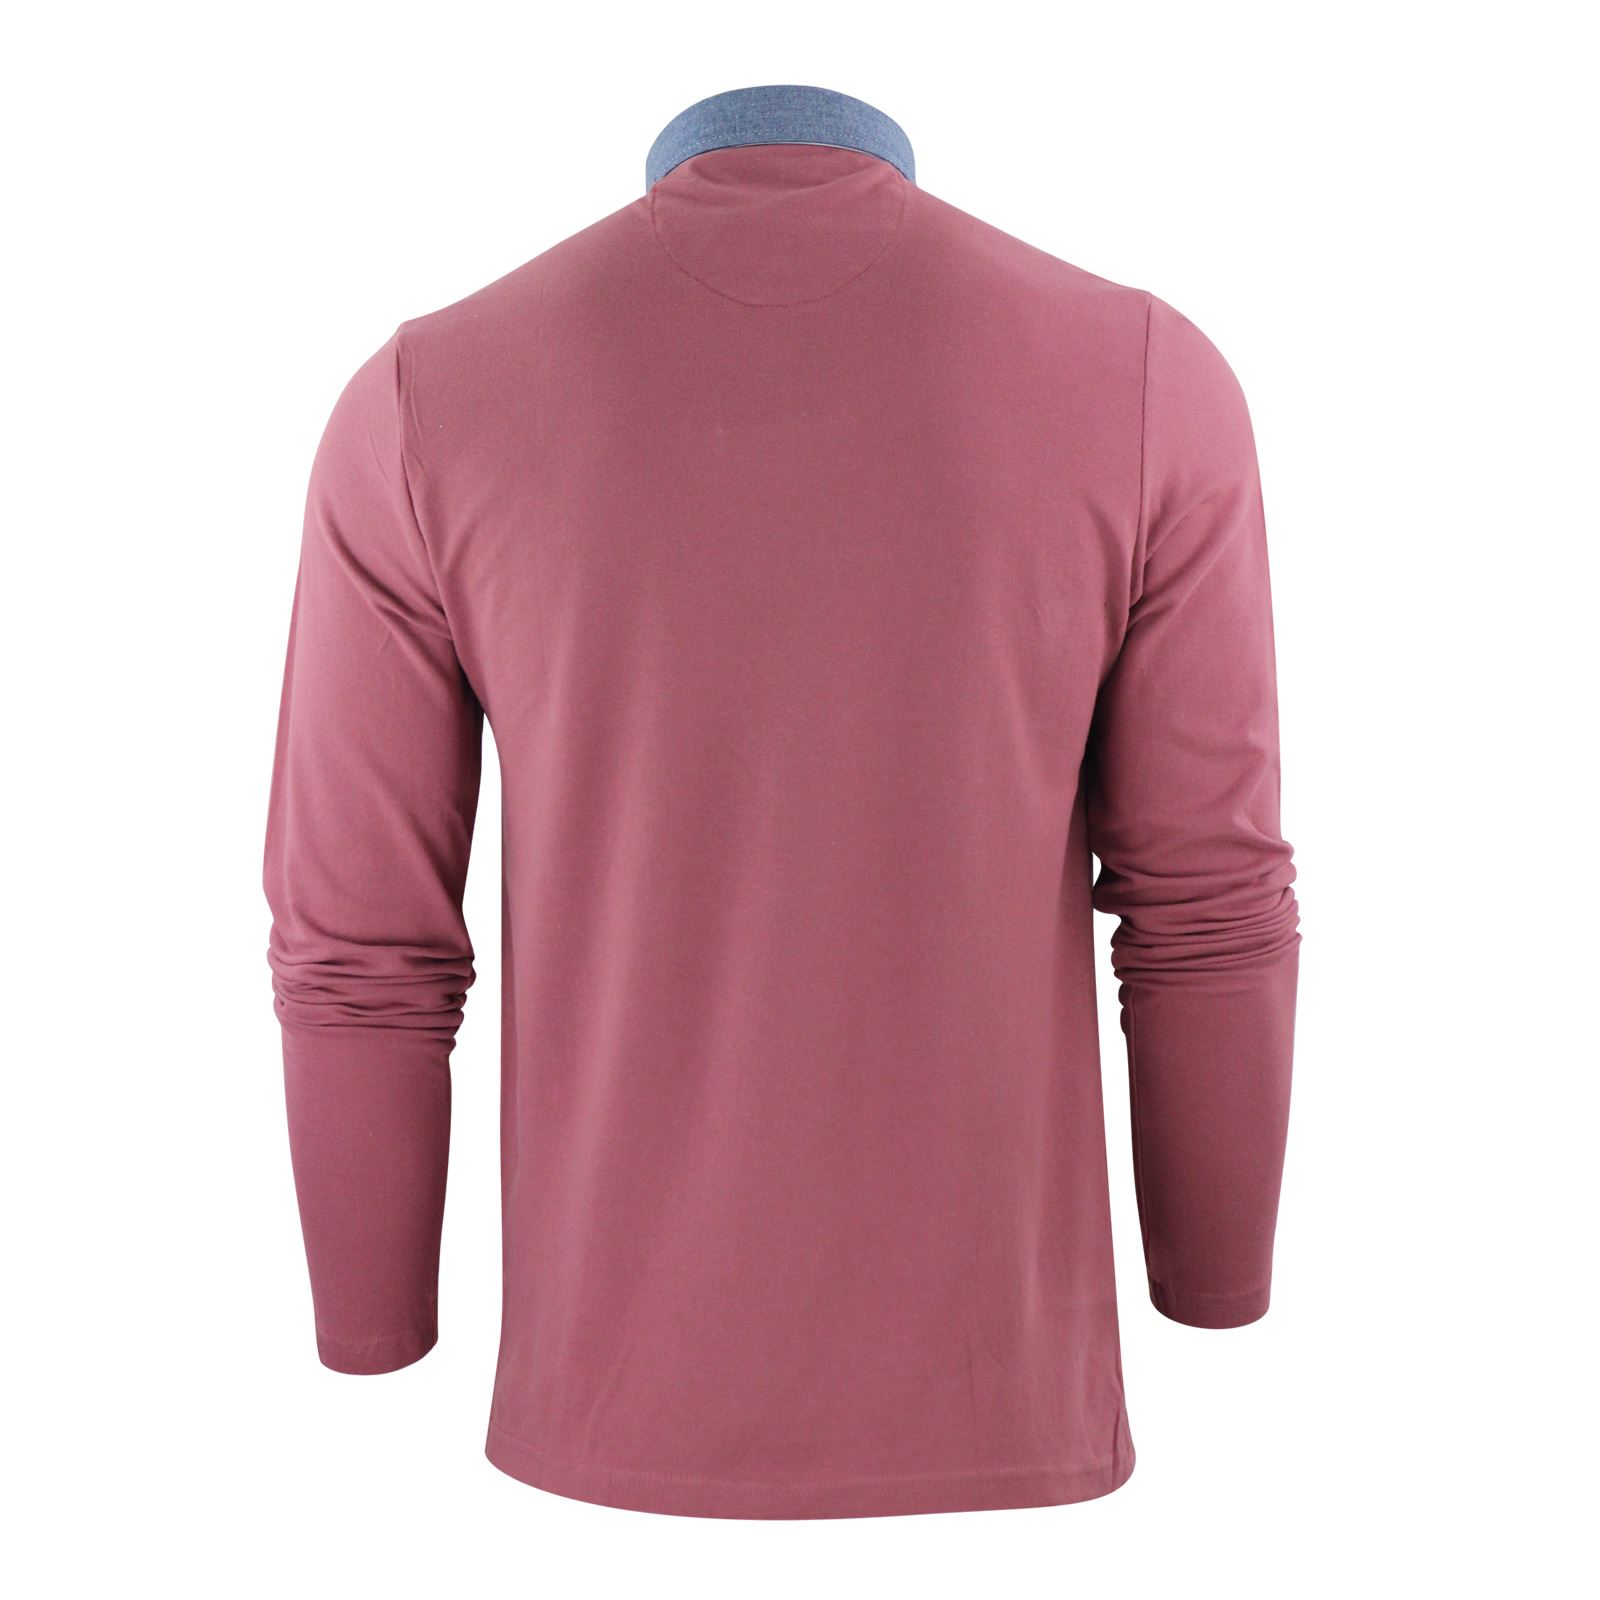 Para-Hombre-Polo-T-Shirt-Alma-valiente-Hera-Manga-Larga-De-Algodon-Casual-Top miniatura 18